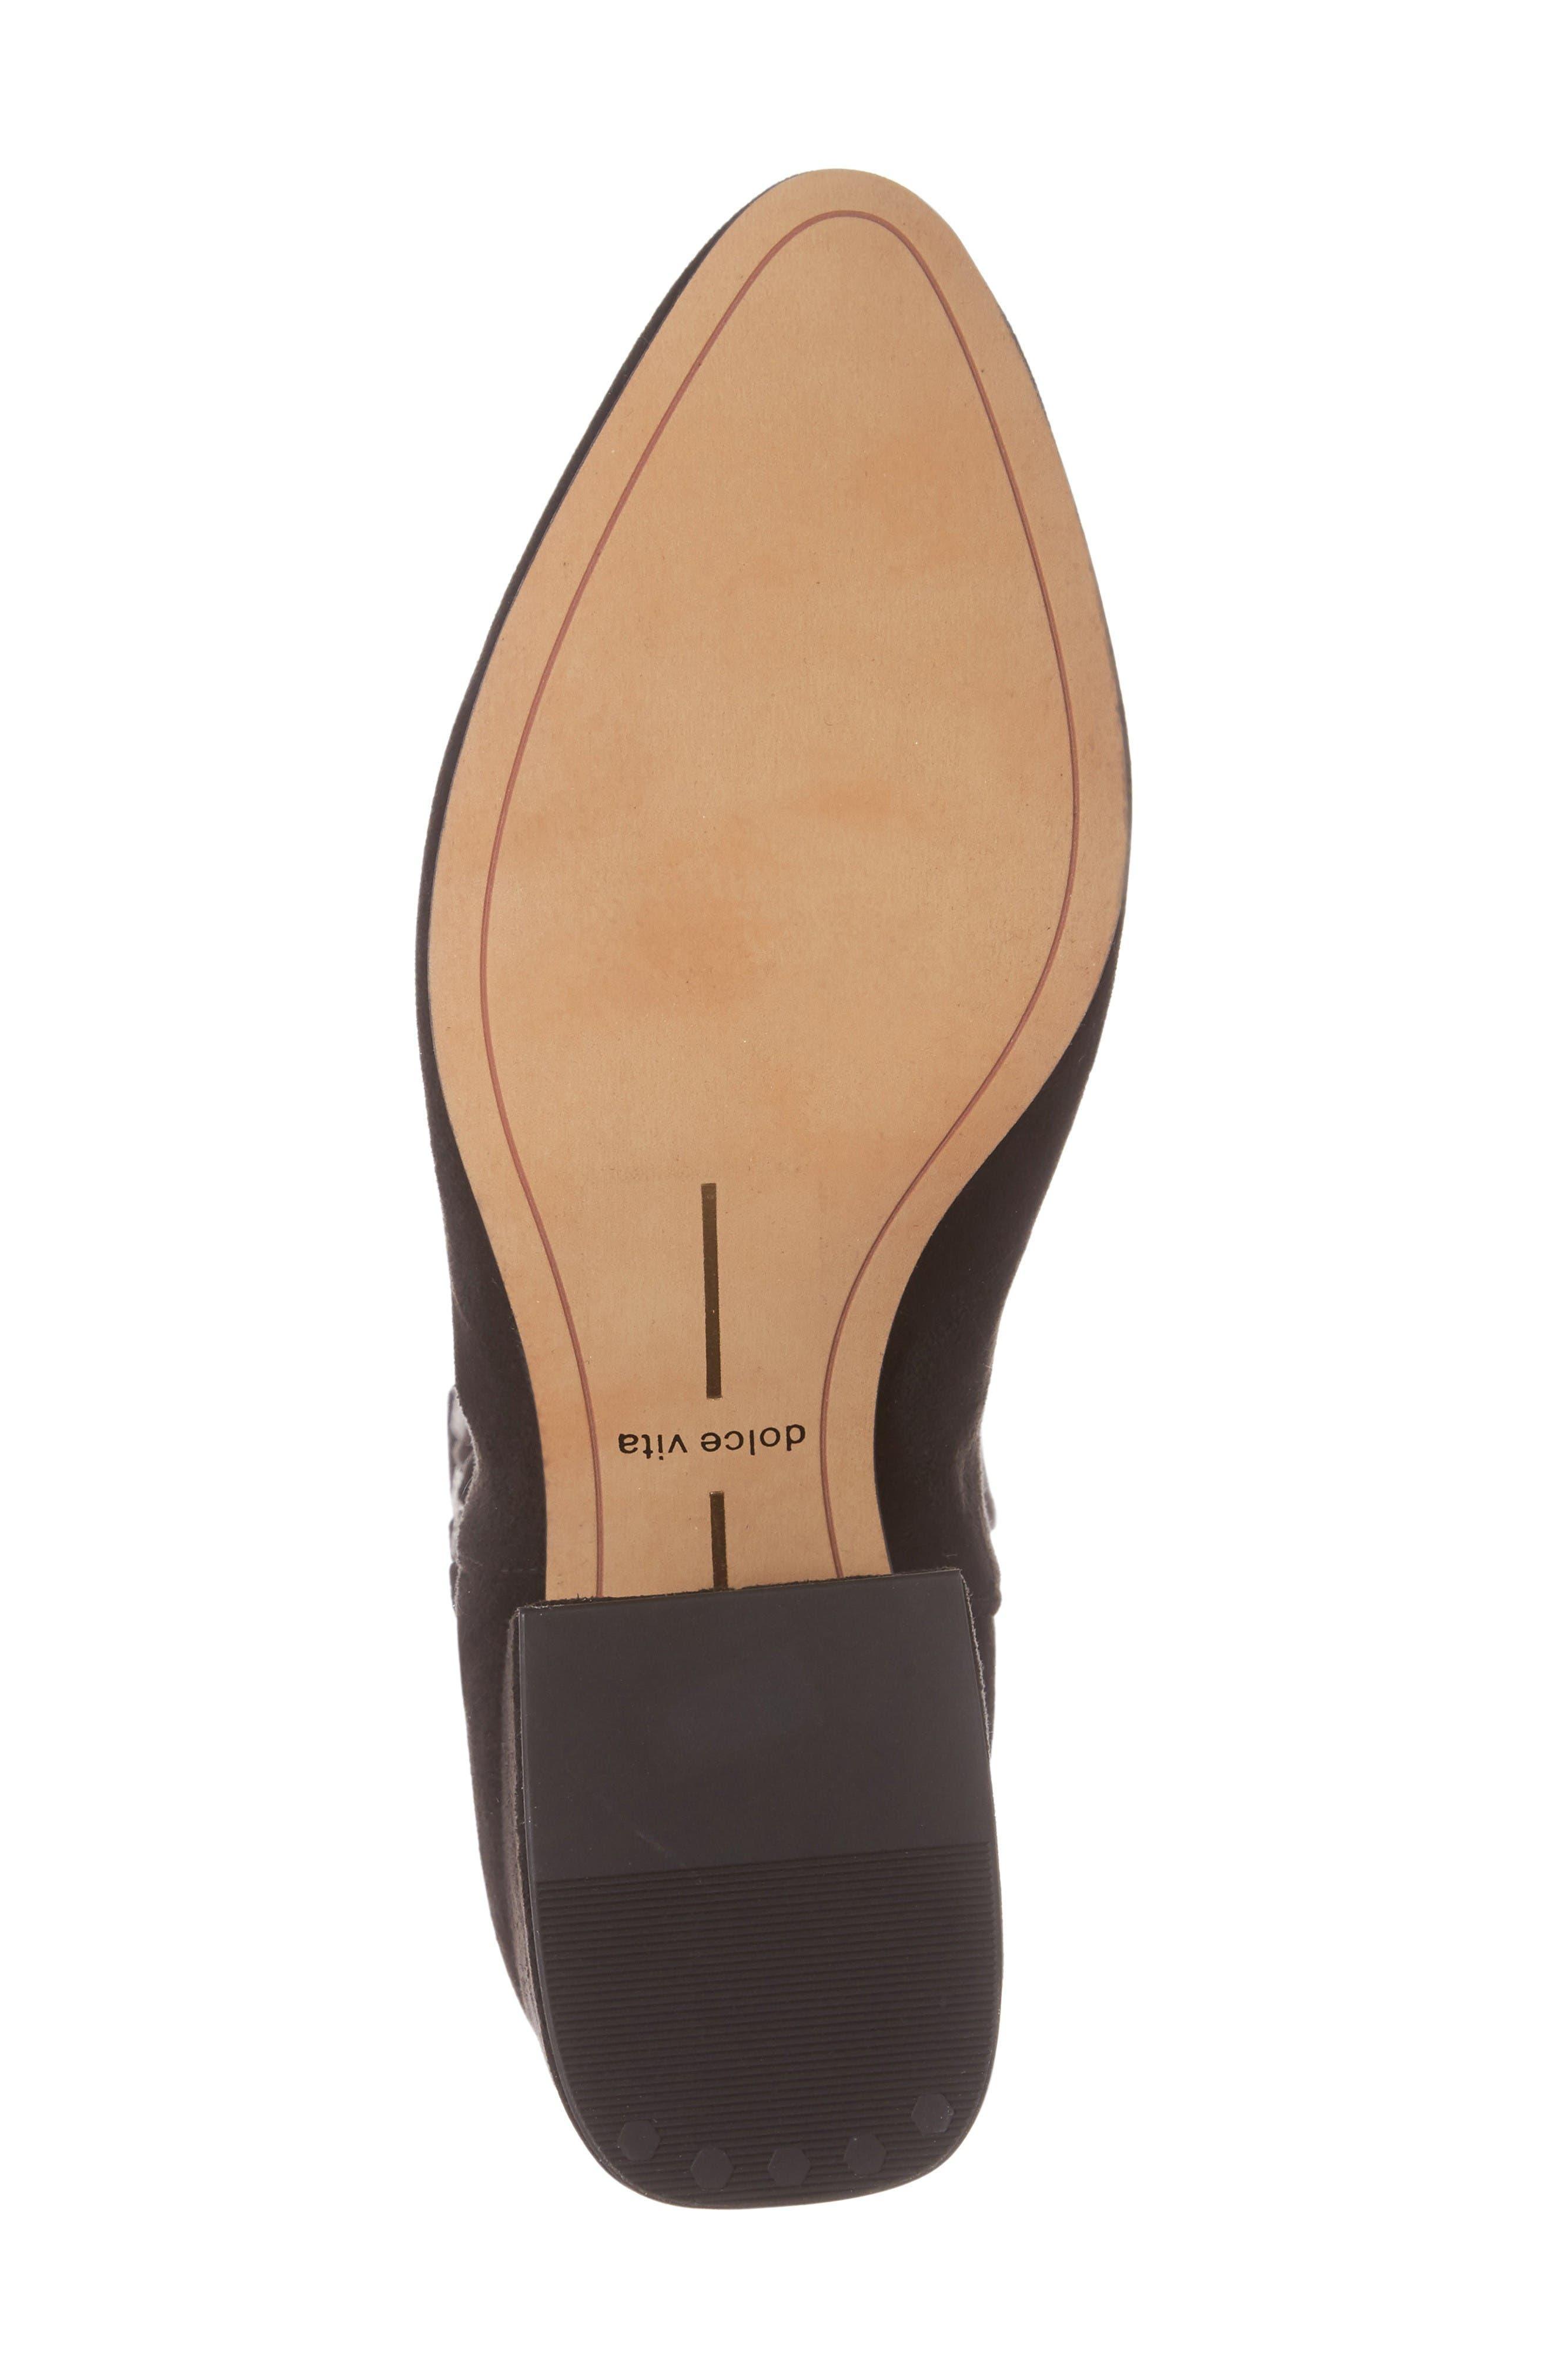 Vix Thigh High Boot,                             Alternate thumbnail 5, color,                             Black Suede